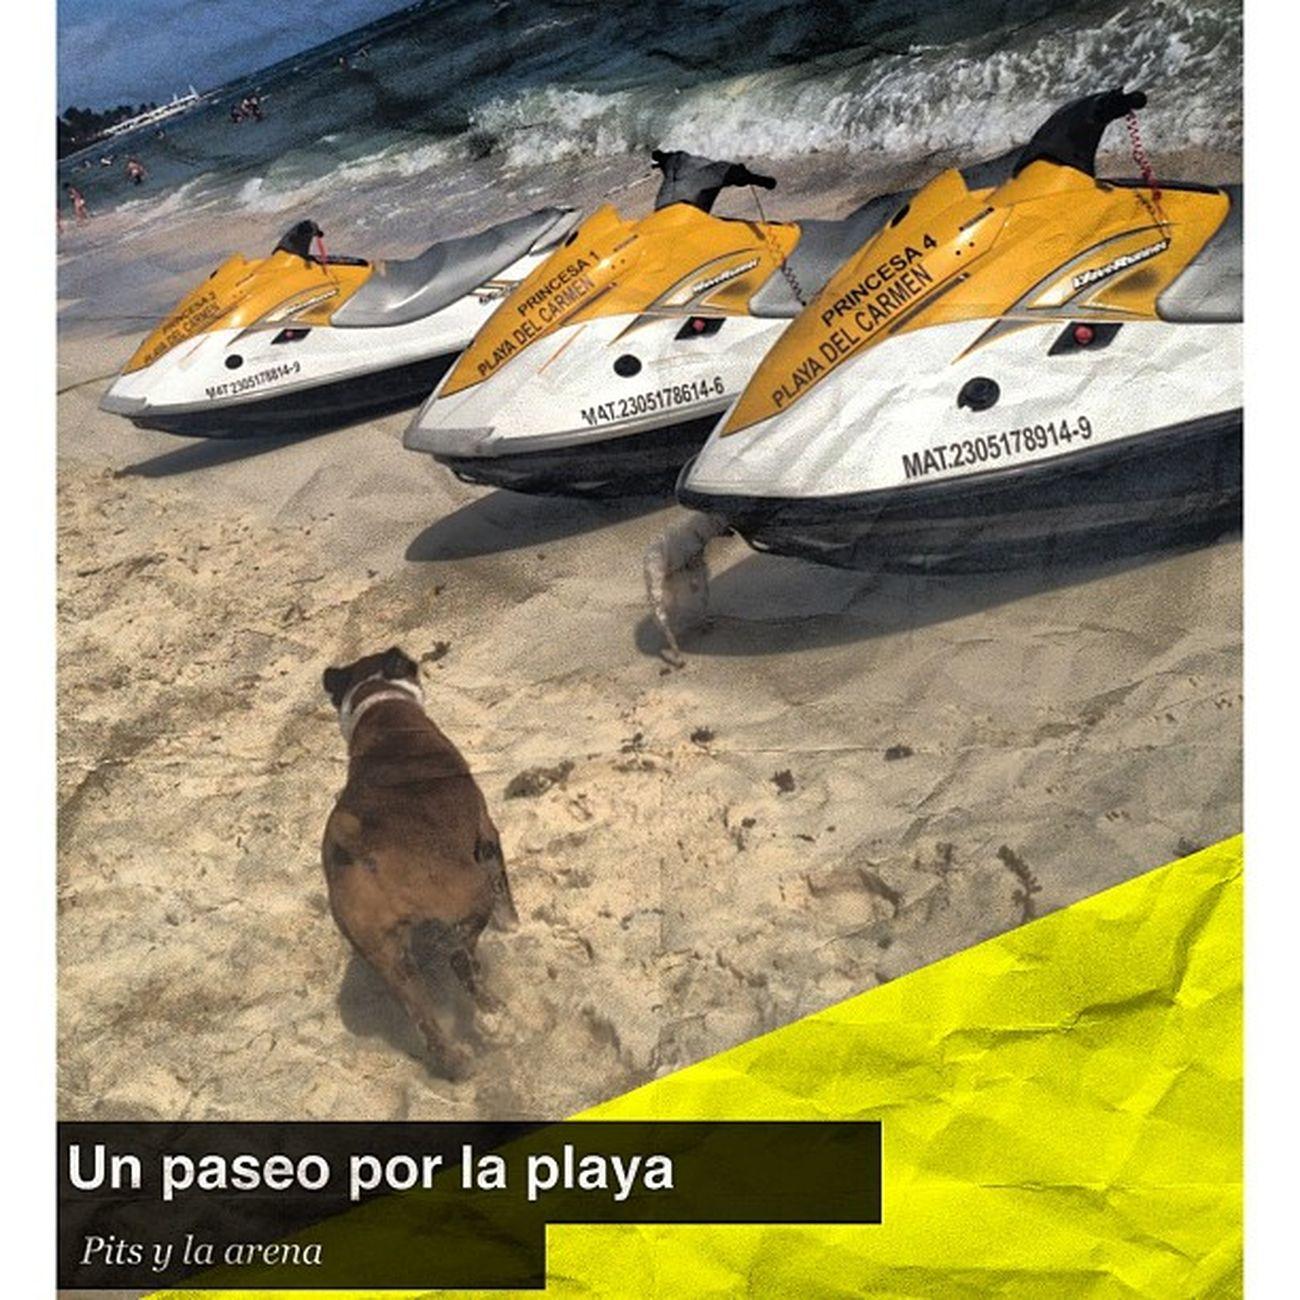 Pita Playa Squaready Quintanaroo Cancun Playadelcarmen Traveler Travel Jetsky Sun Sunset